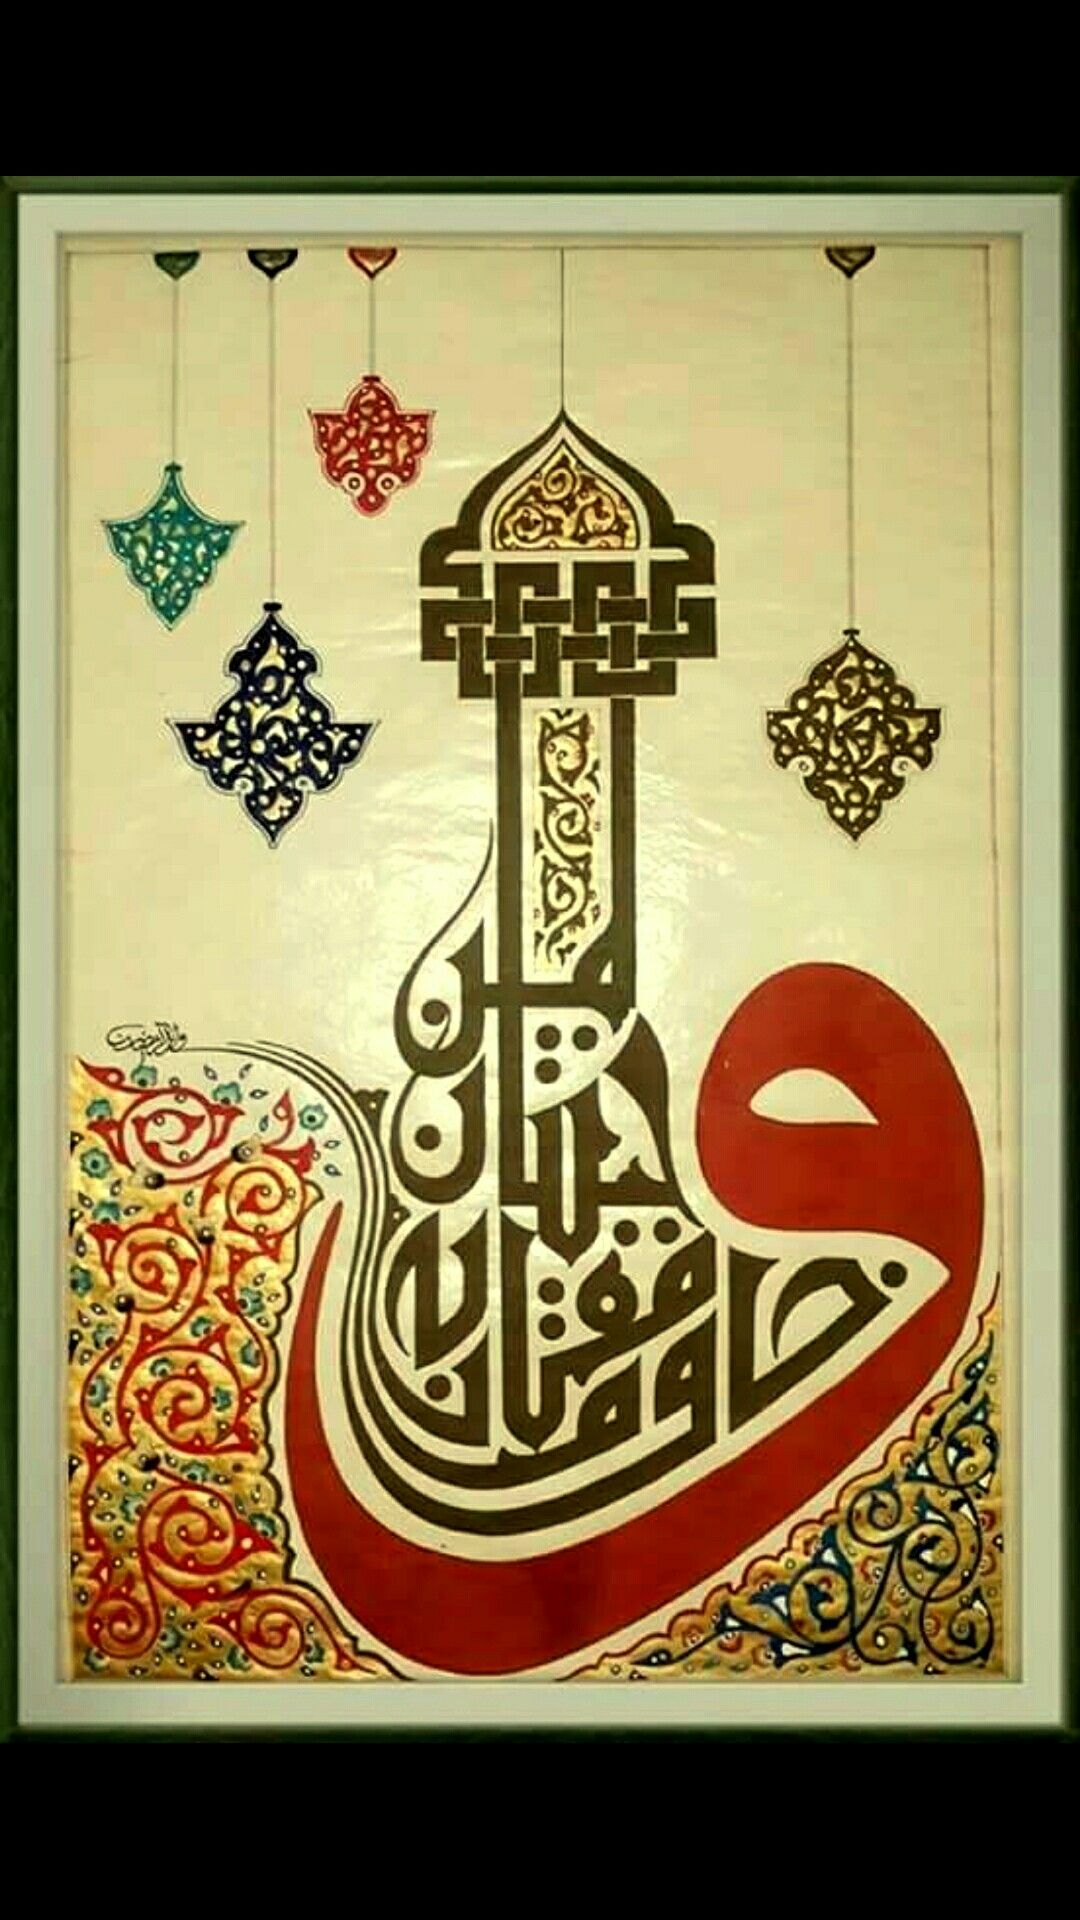 Pin de H. Meerza en holy word's & ethics Arte arabe